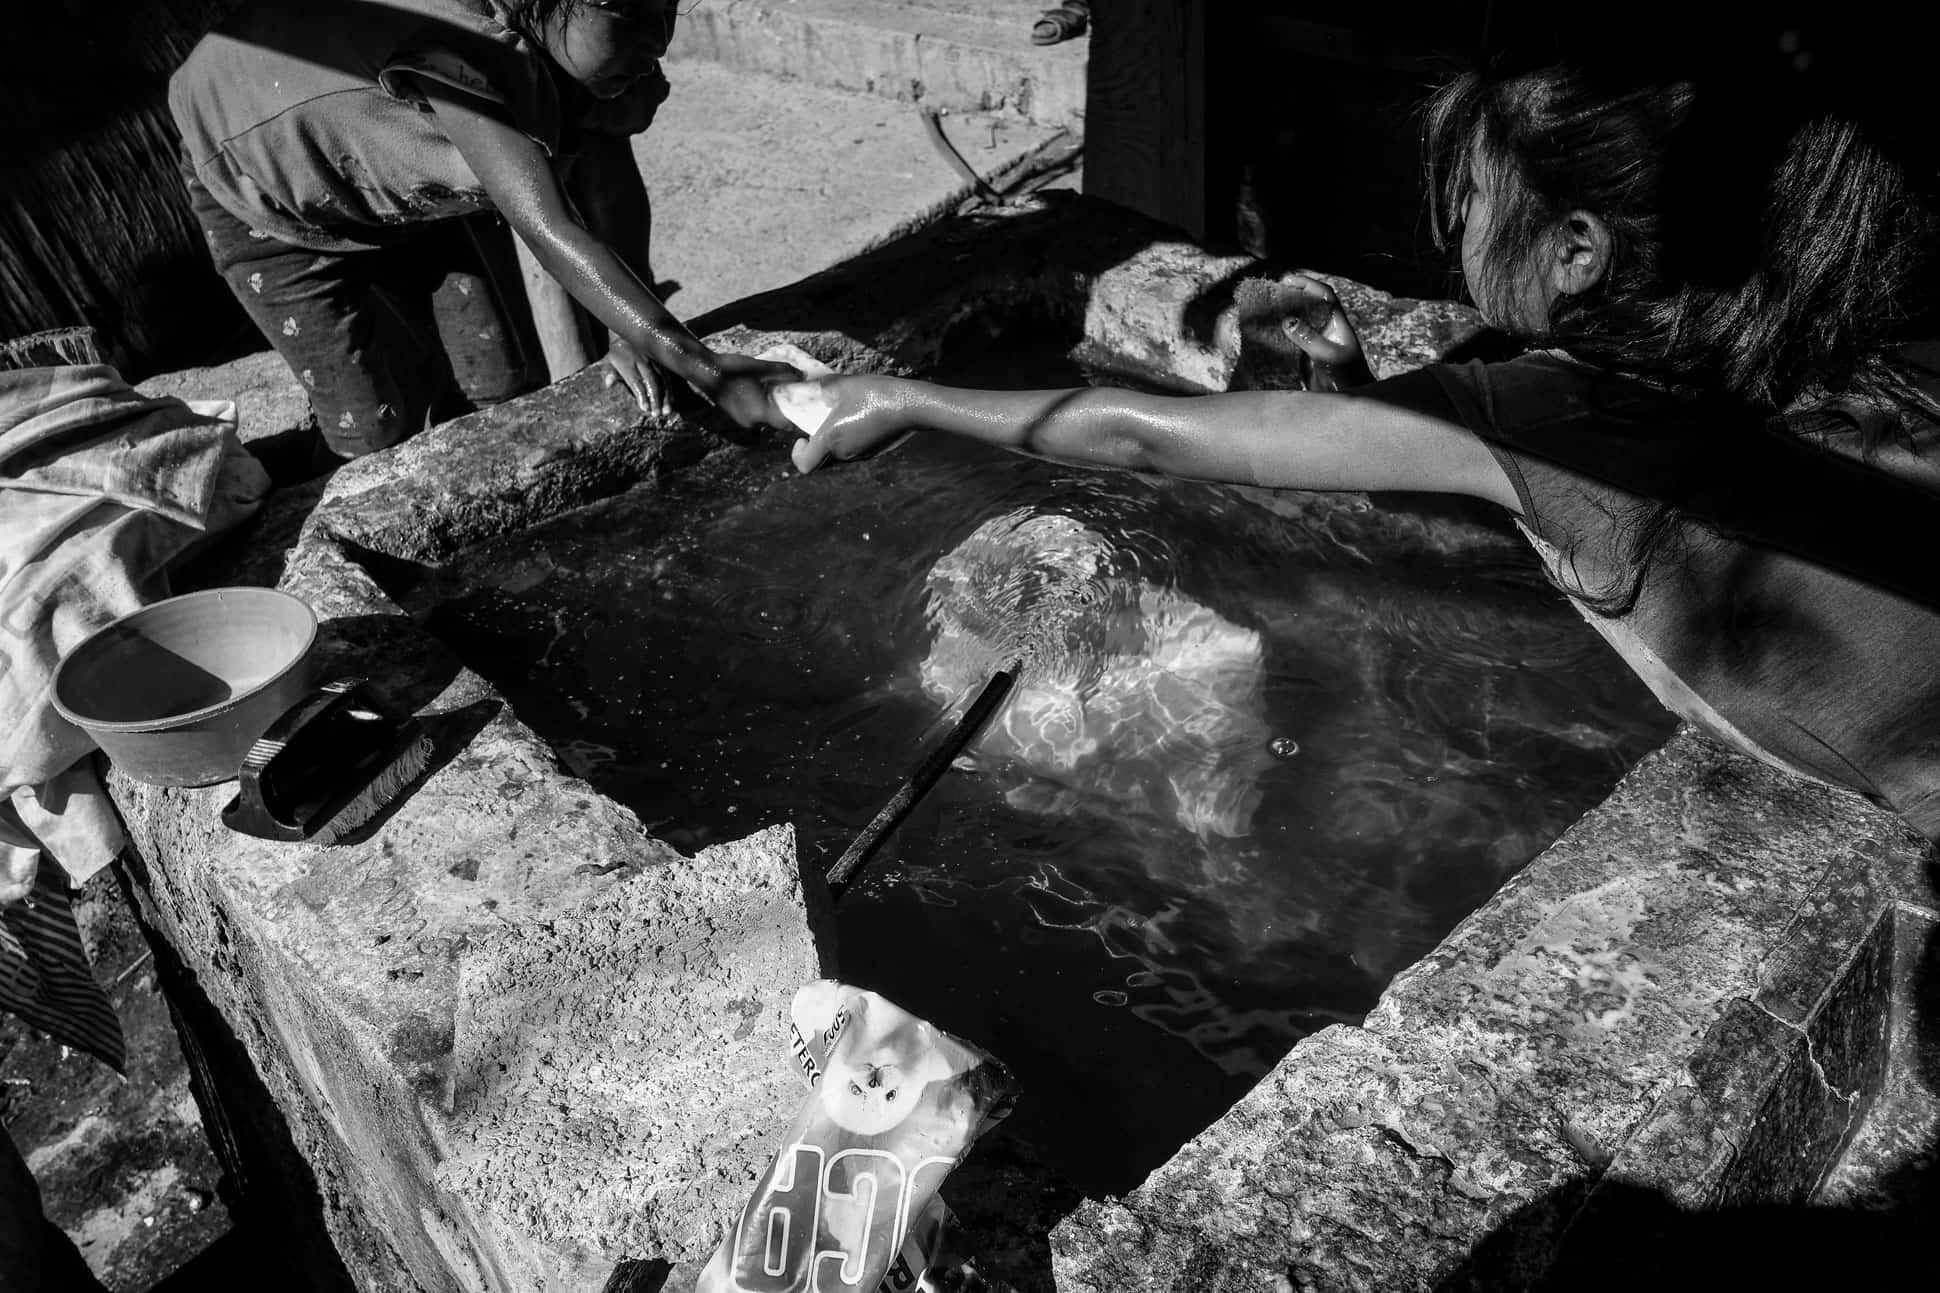 hambre-en-la-tarahumara-nicola-okin-gatopardo-213-mexico-nueva-decada-jla-18